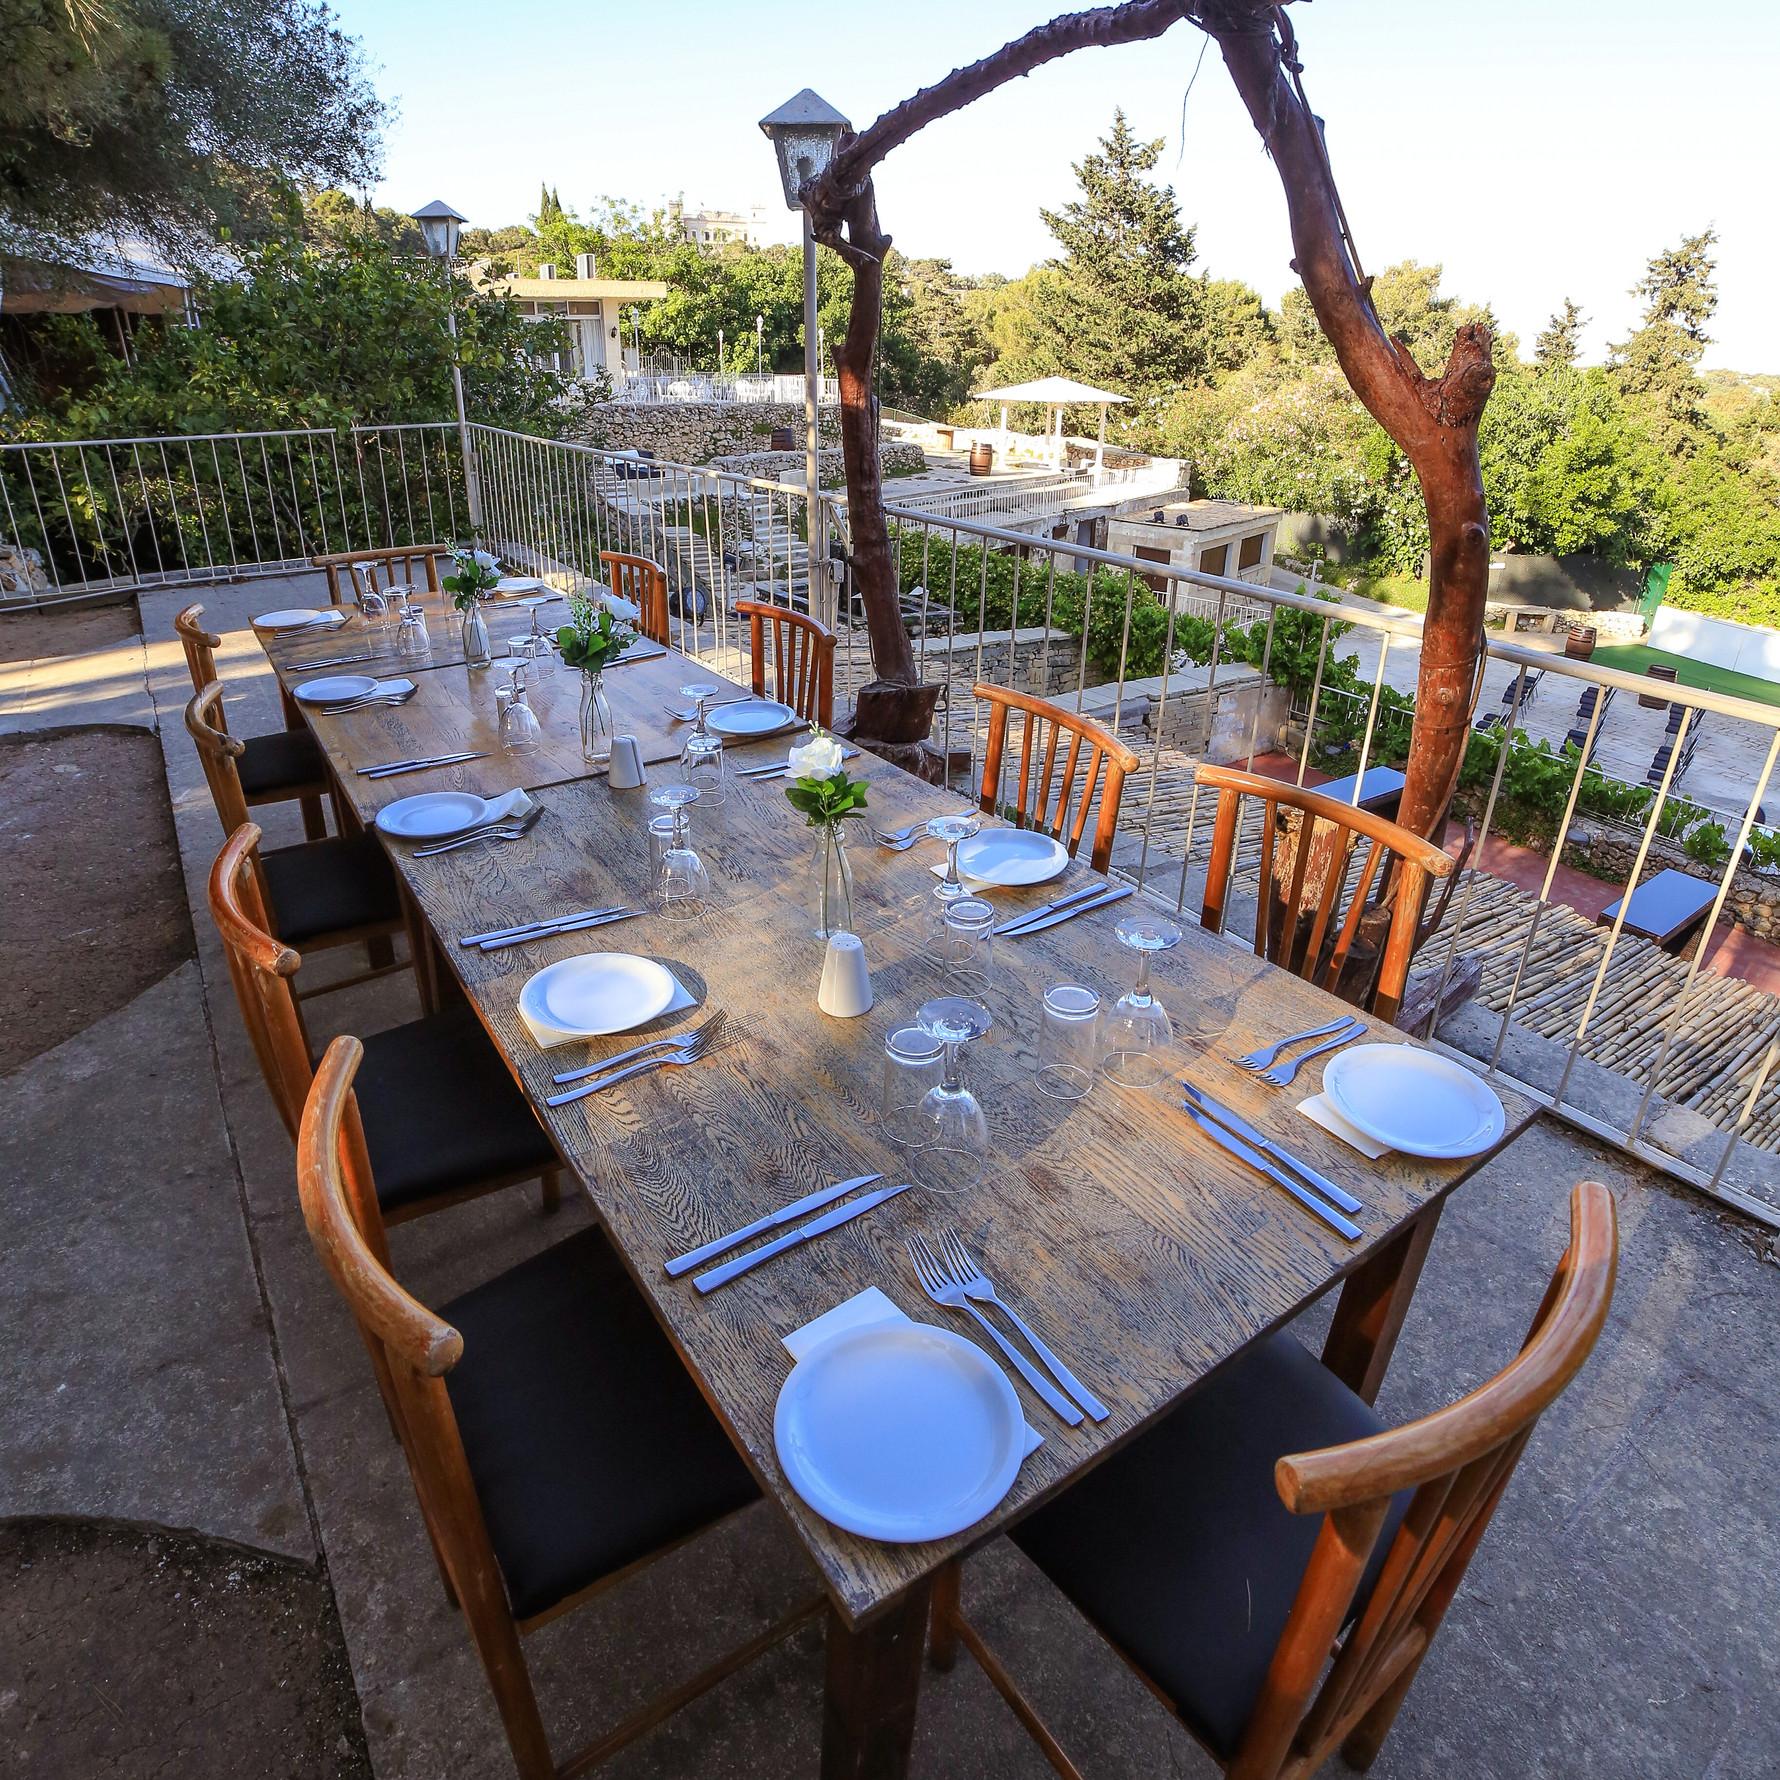 IMG_7146; balcony; daylight; table setup